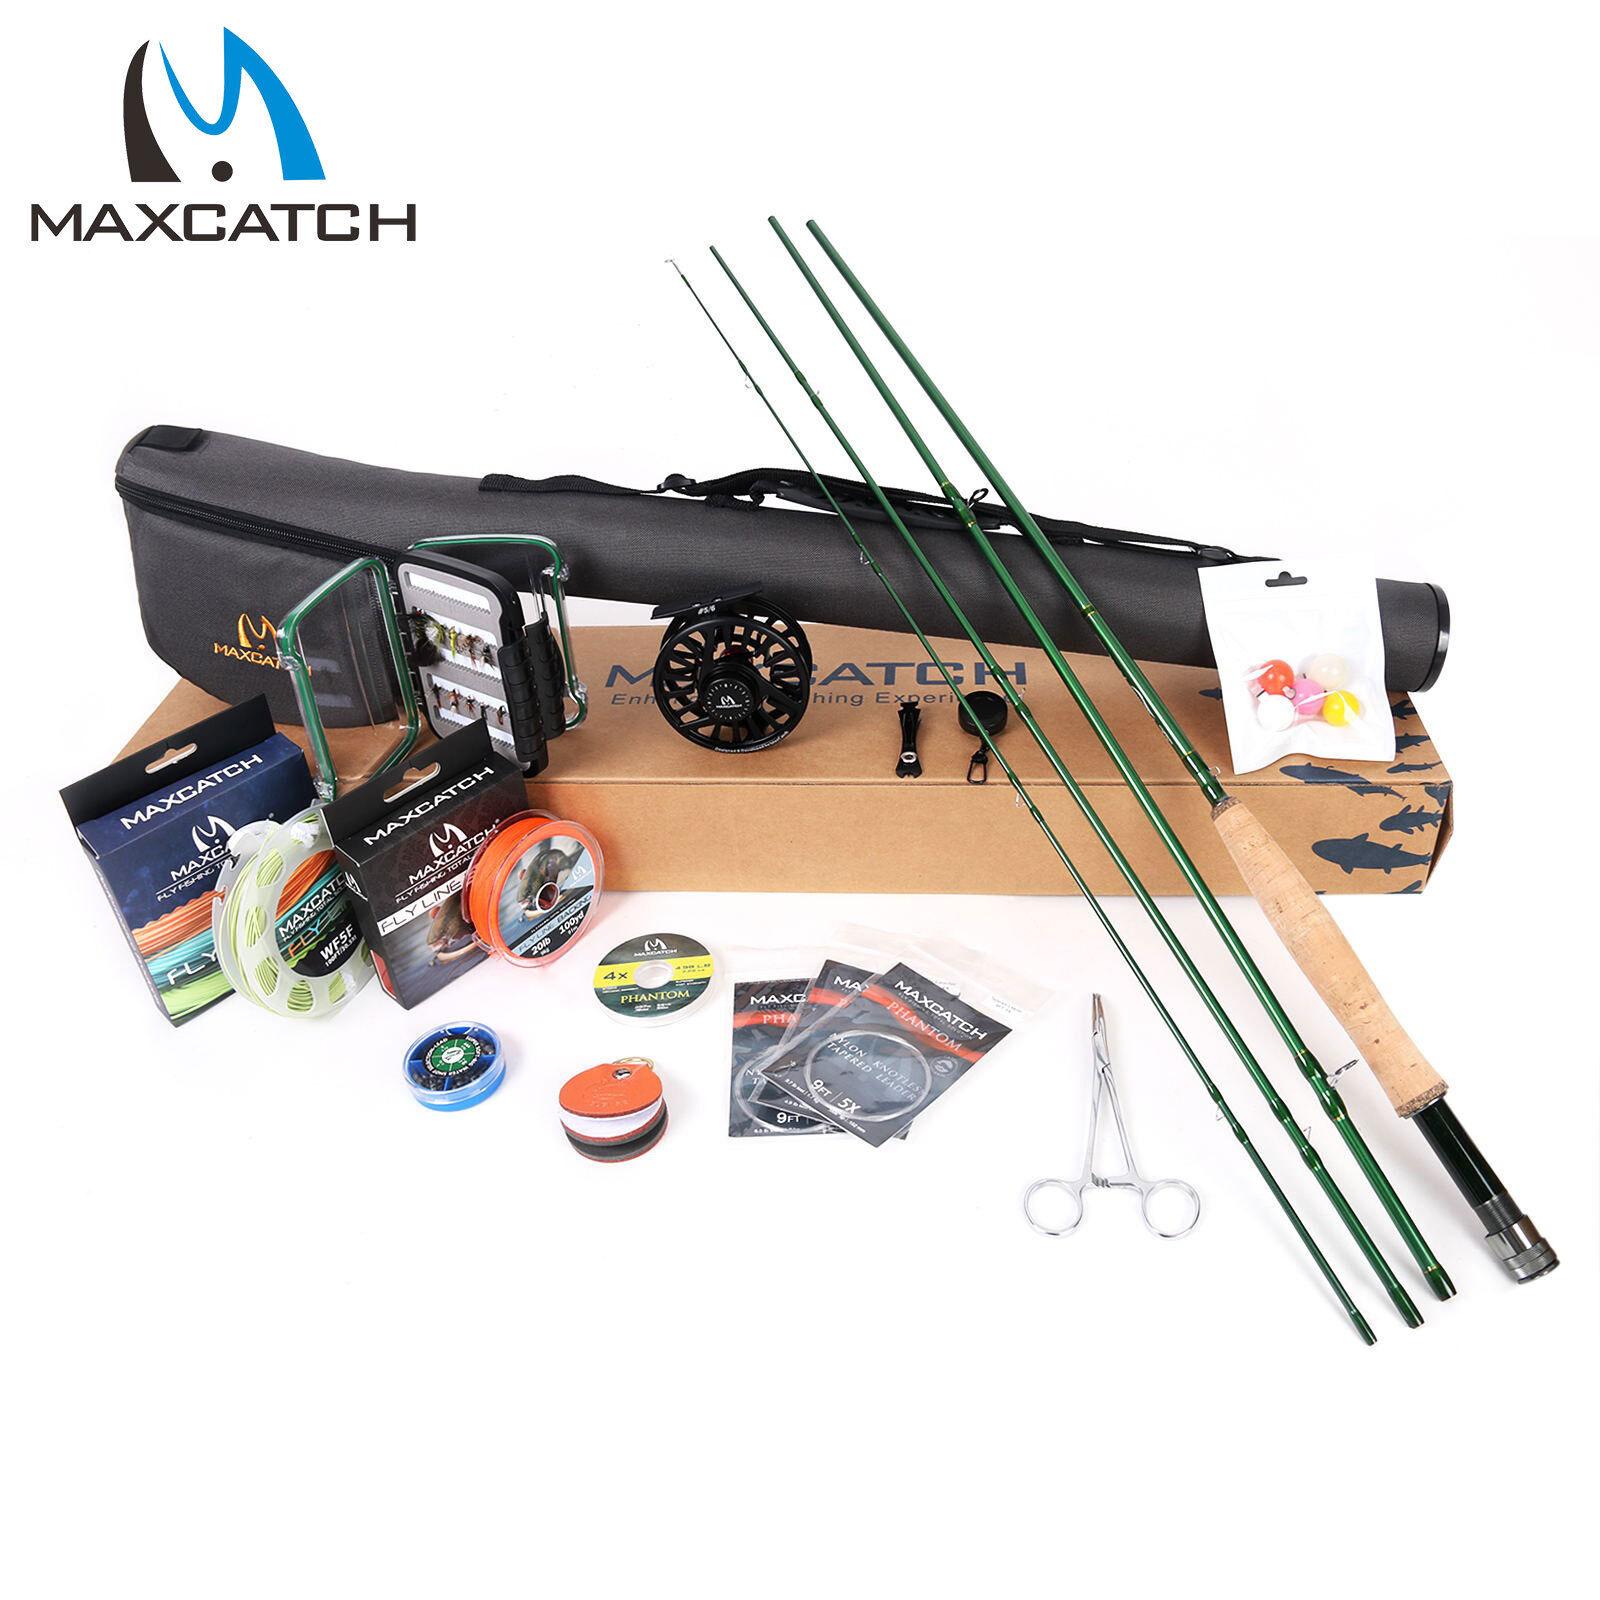 Combo De Caña Reel De Pesca Con Mosca maxcatch completa 9' Kit Completo De Arranque Traje De Pesca